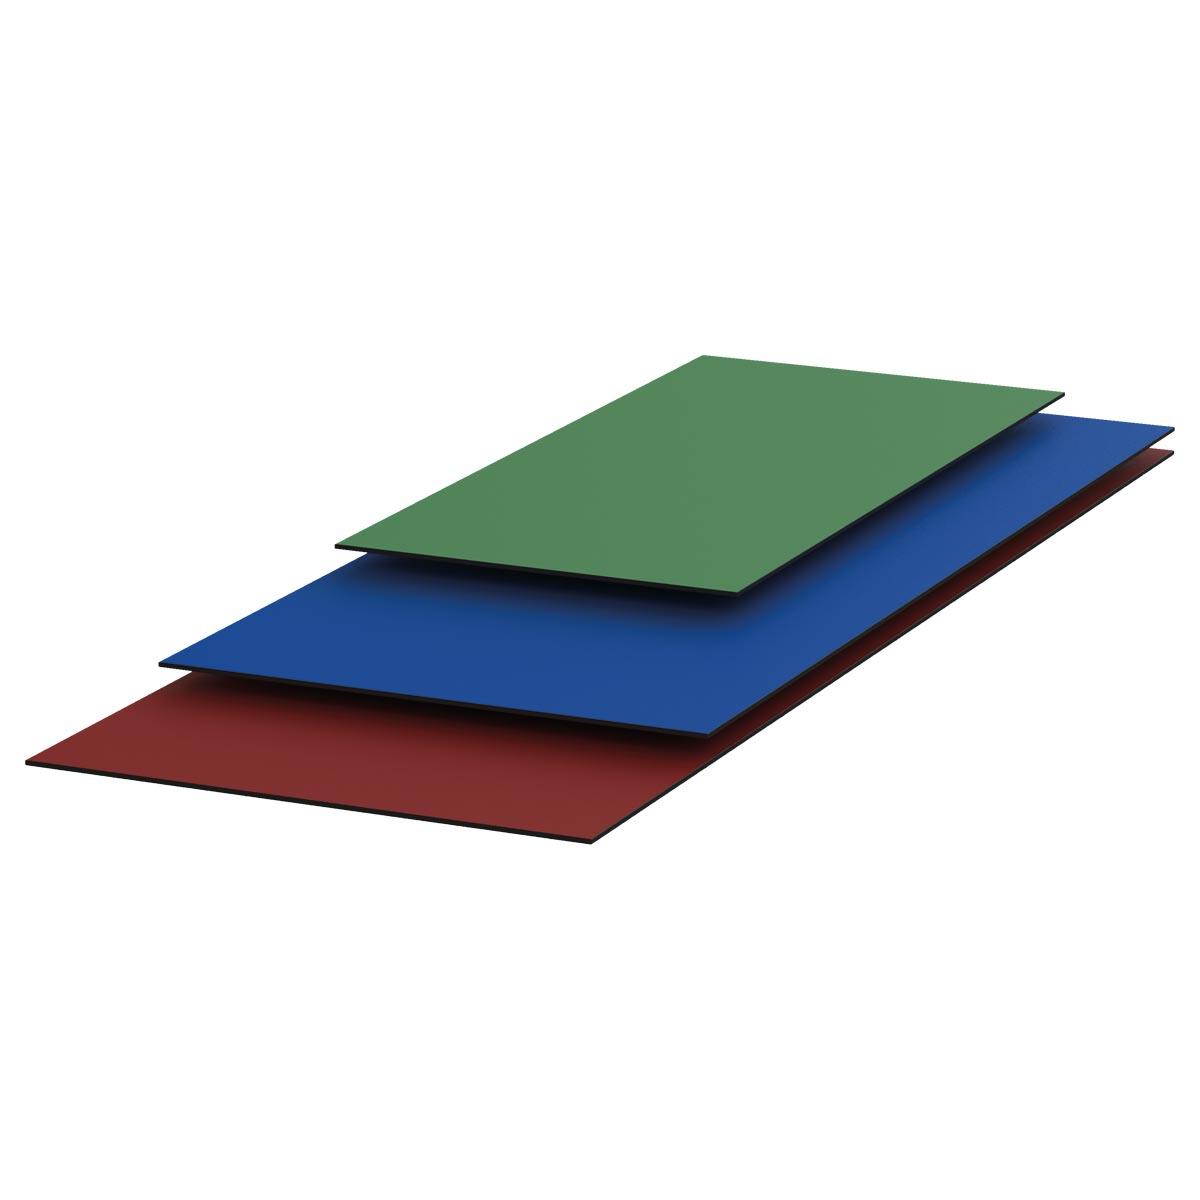 - https://www.werzalit.com/en/product/square-cladding-panel-3650-x-1320-mm-panel-thickness-6-mm-decor-858-brick/